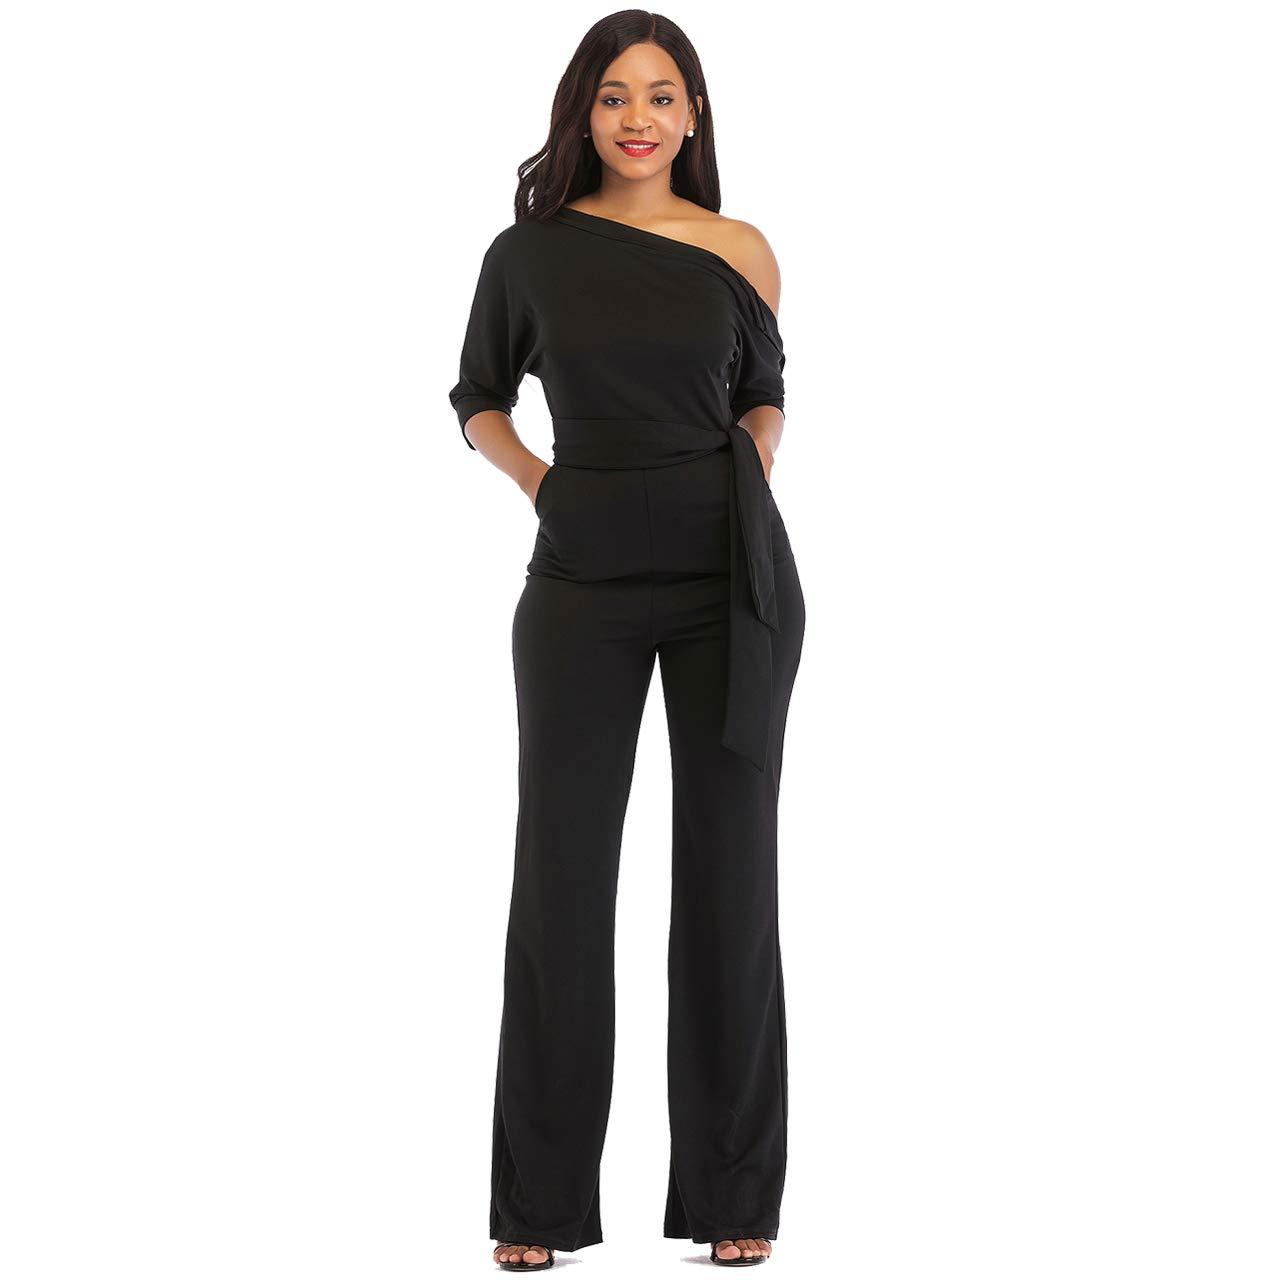 43bc5368e0e3 Amazon.com: One Shoulder Jumpsuits for Women Elegant Night Sexy Casual  Summer Rompers Dress Wide Leg Shorts Long Pants Belt Pockets: Clothing